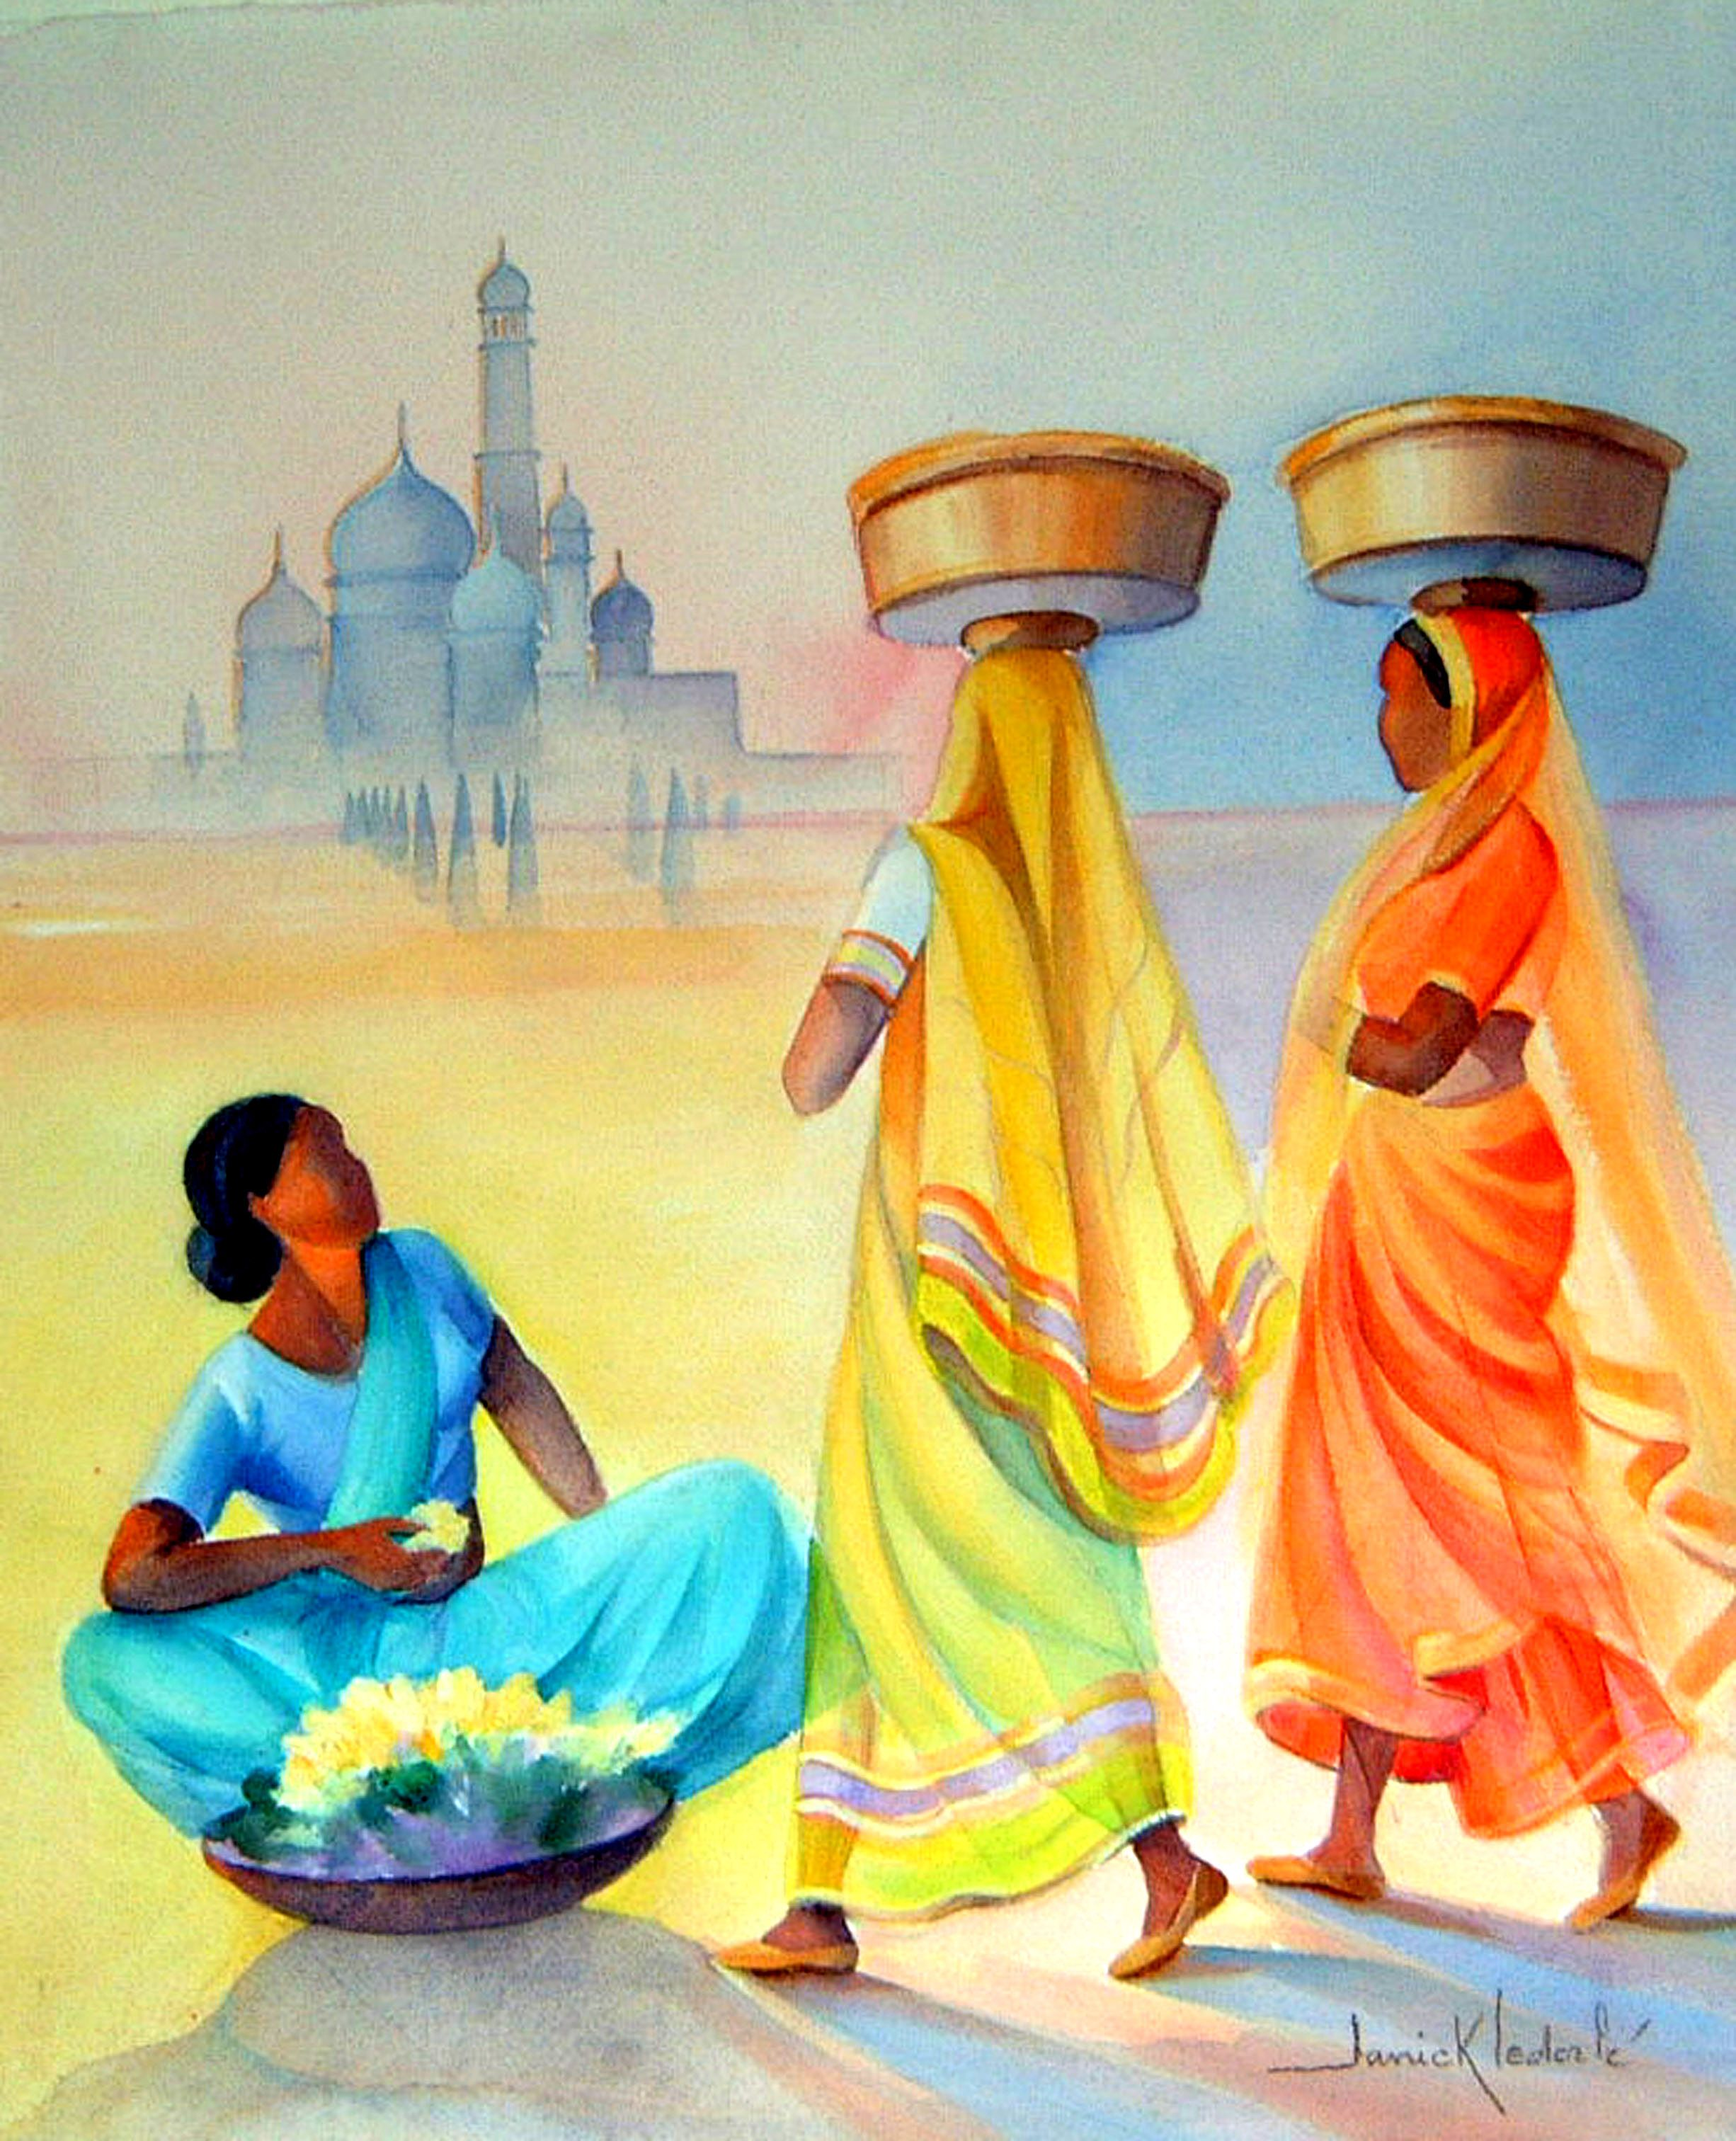 Image du Blog lusile17.centerblog.net | Art-Indian | Pinterest ...